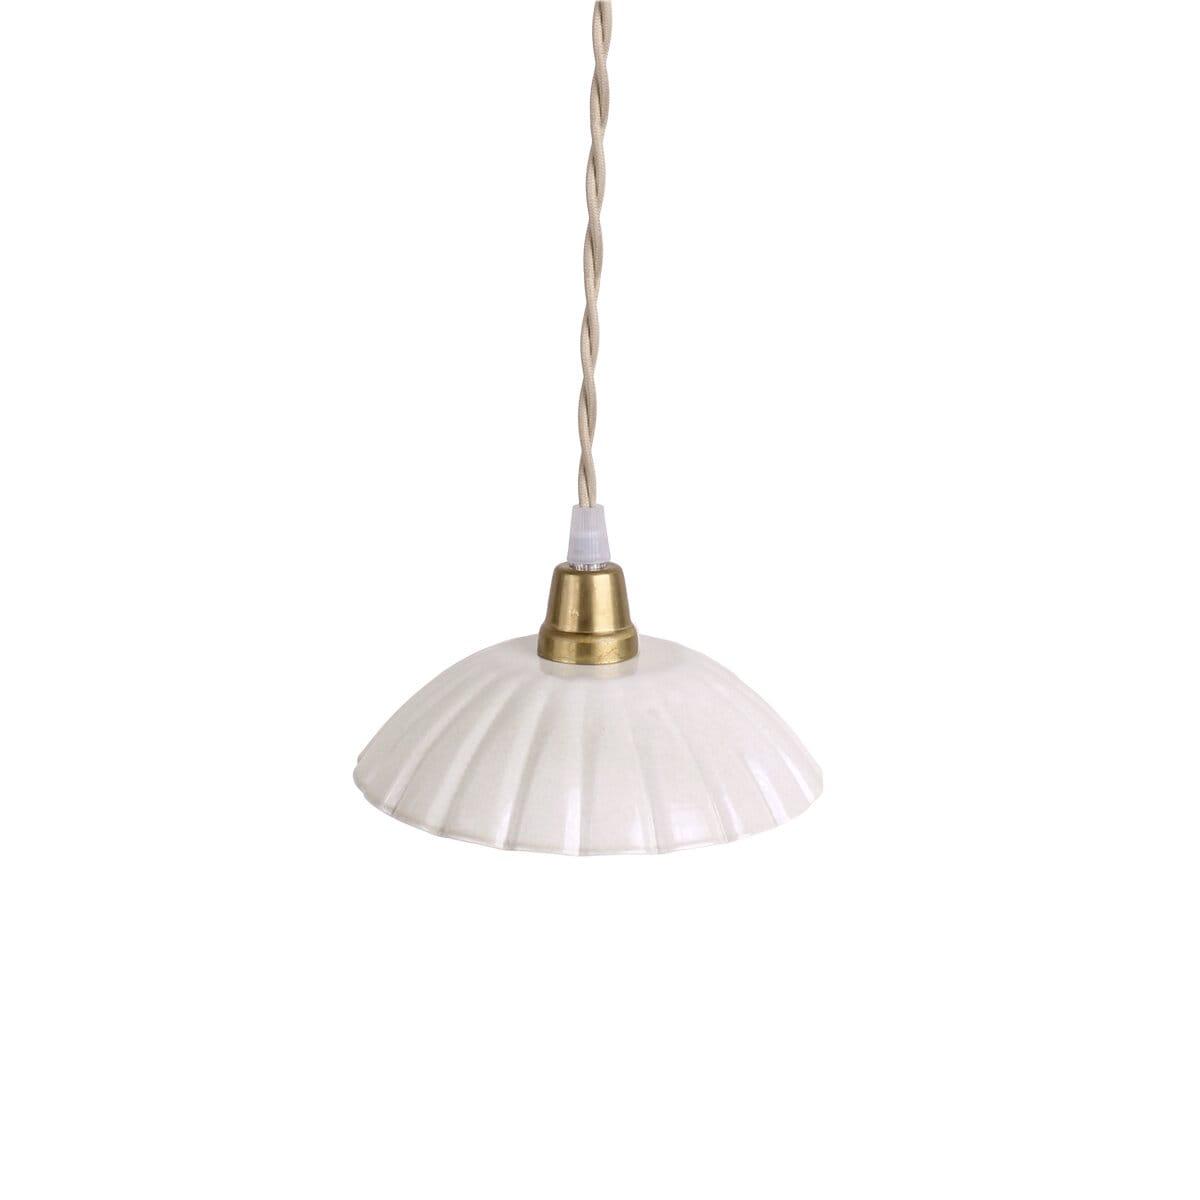 Pendant Lamp Ingrid Antique White Small